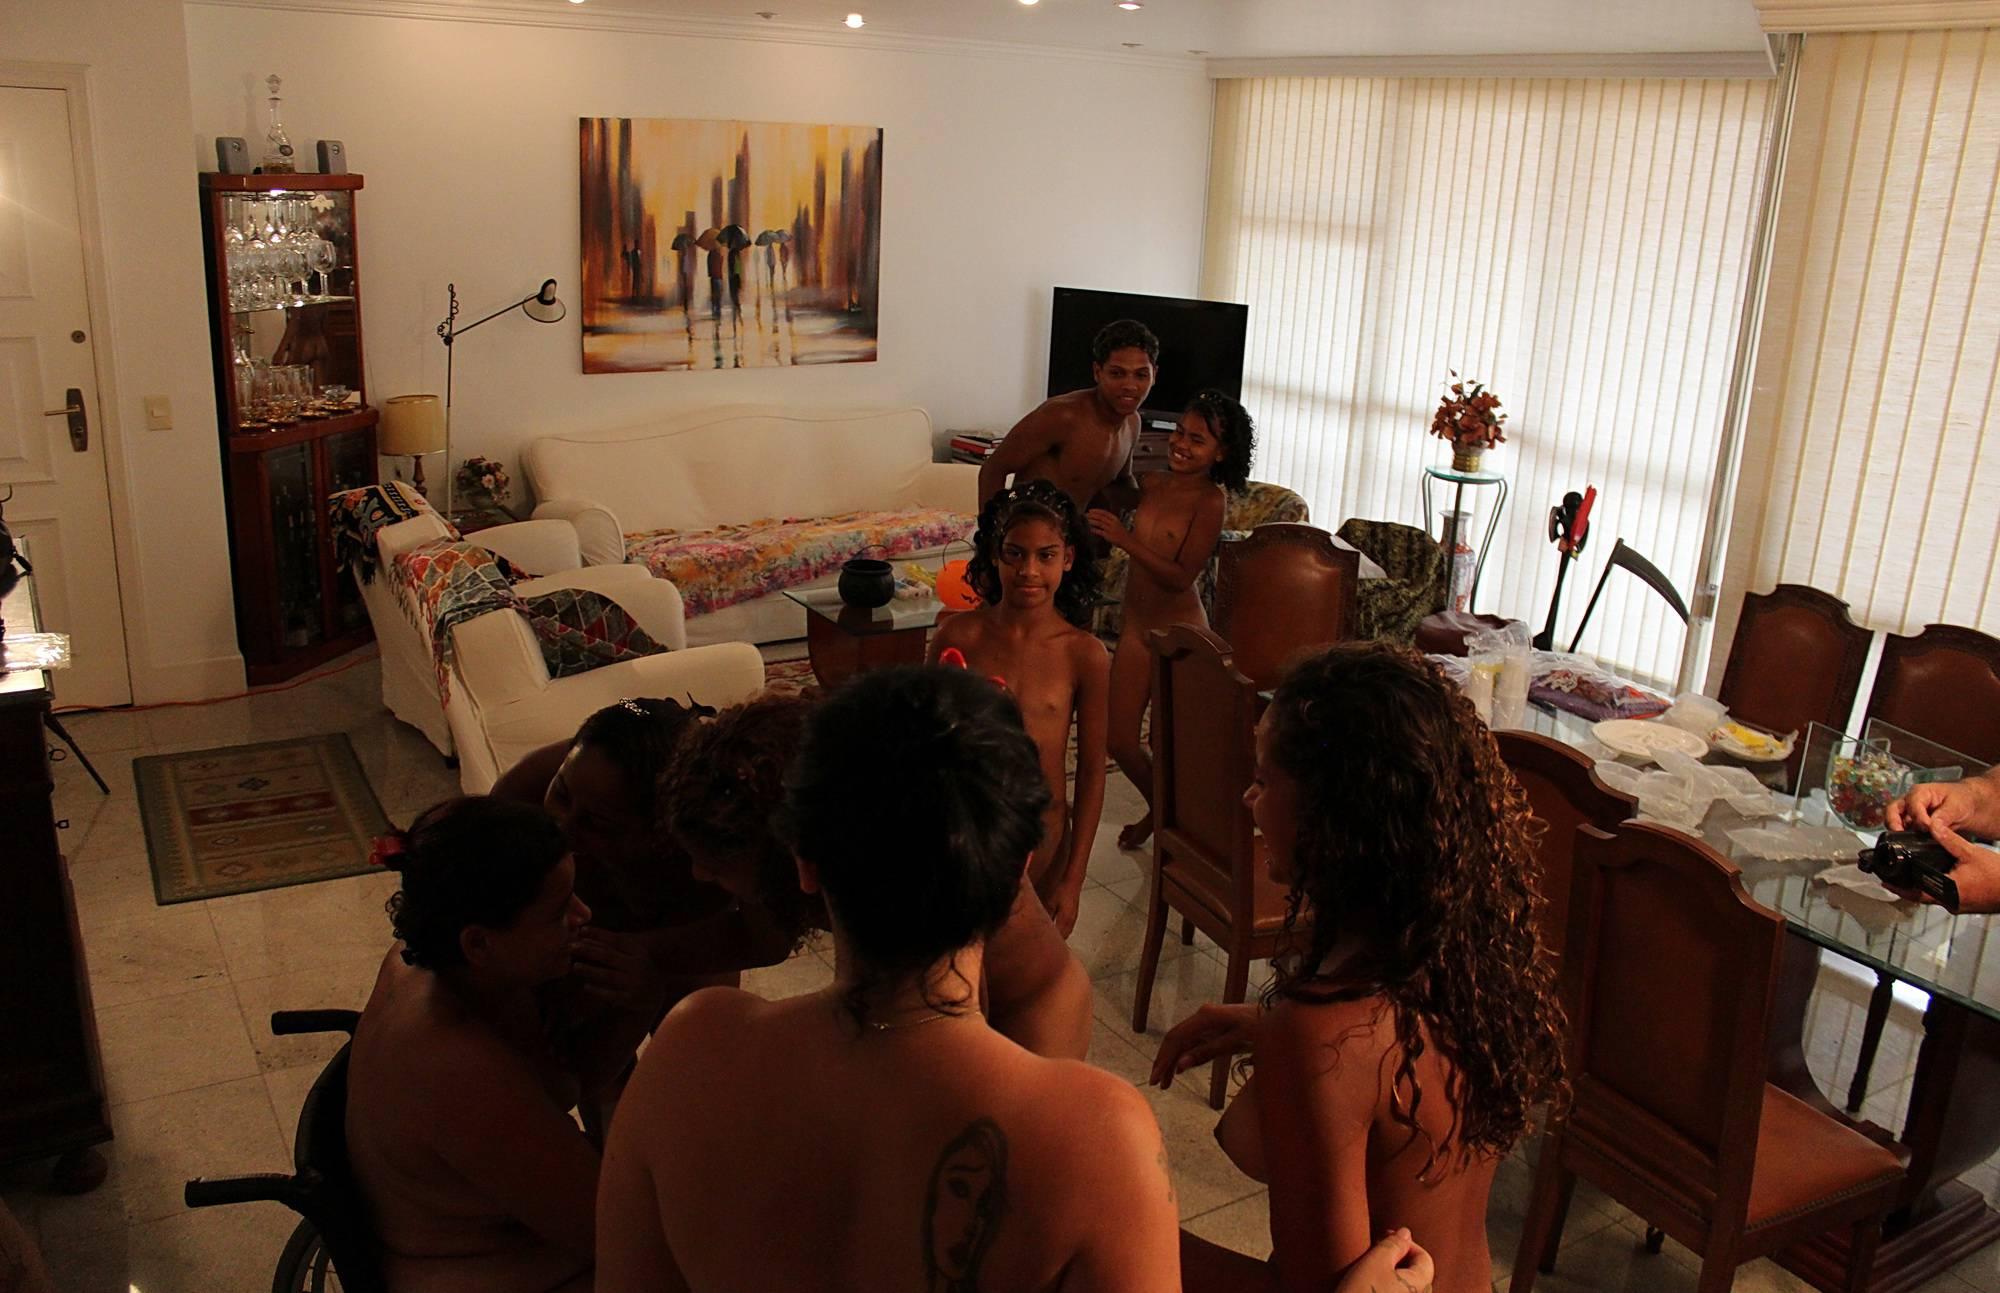 Nudist Gallery Dining Room Greeting - 1